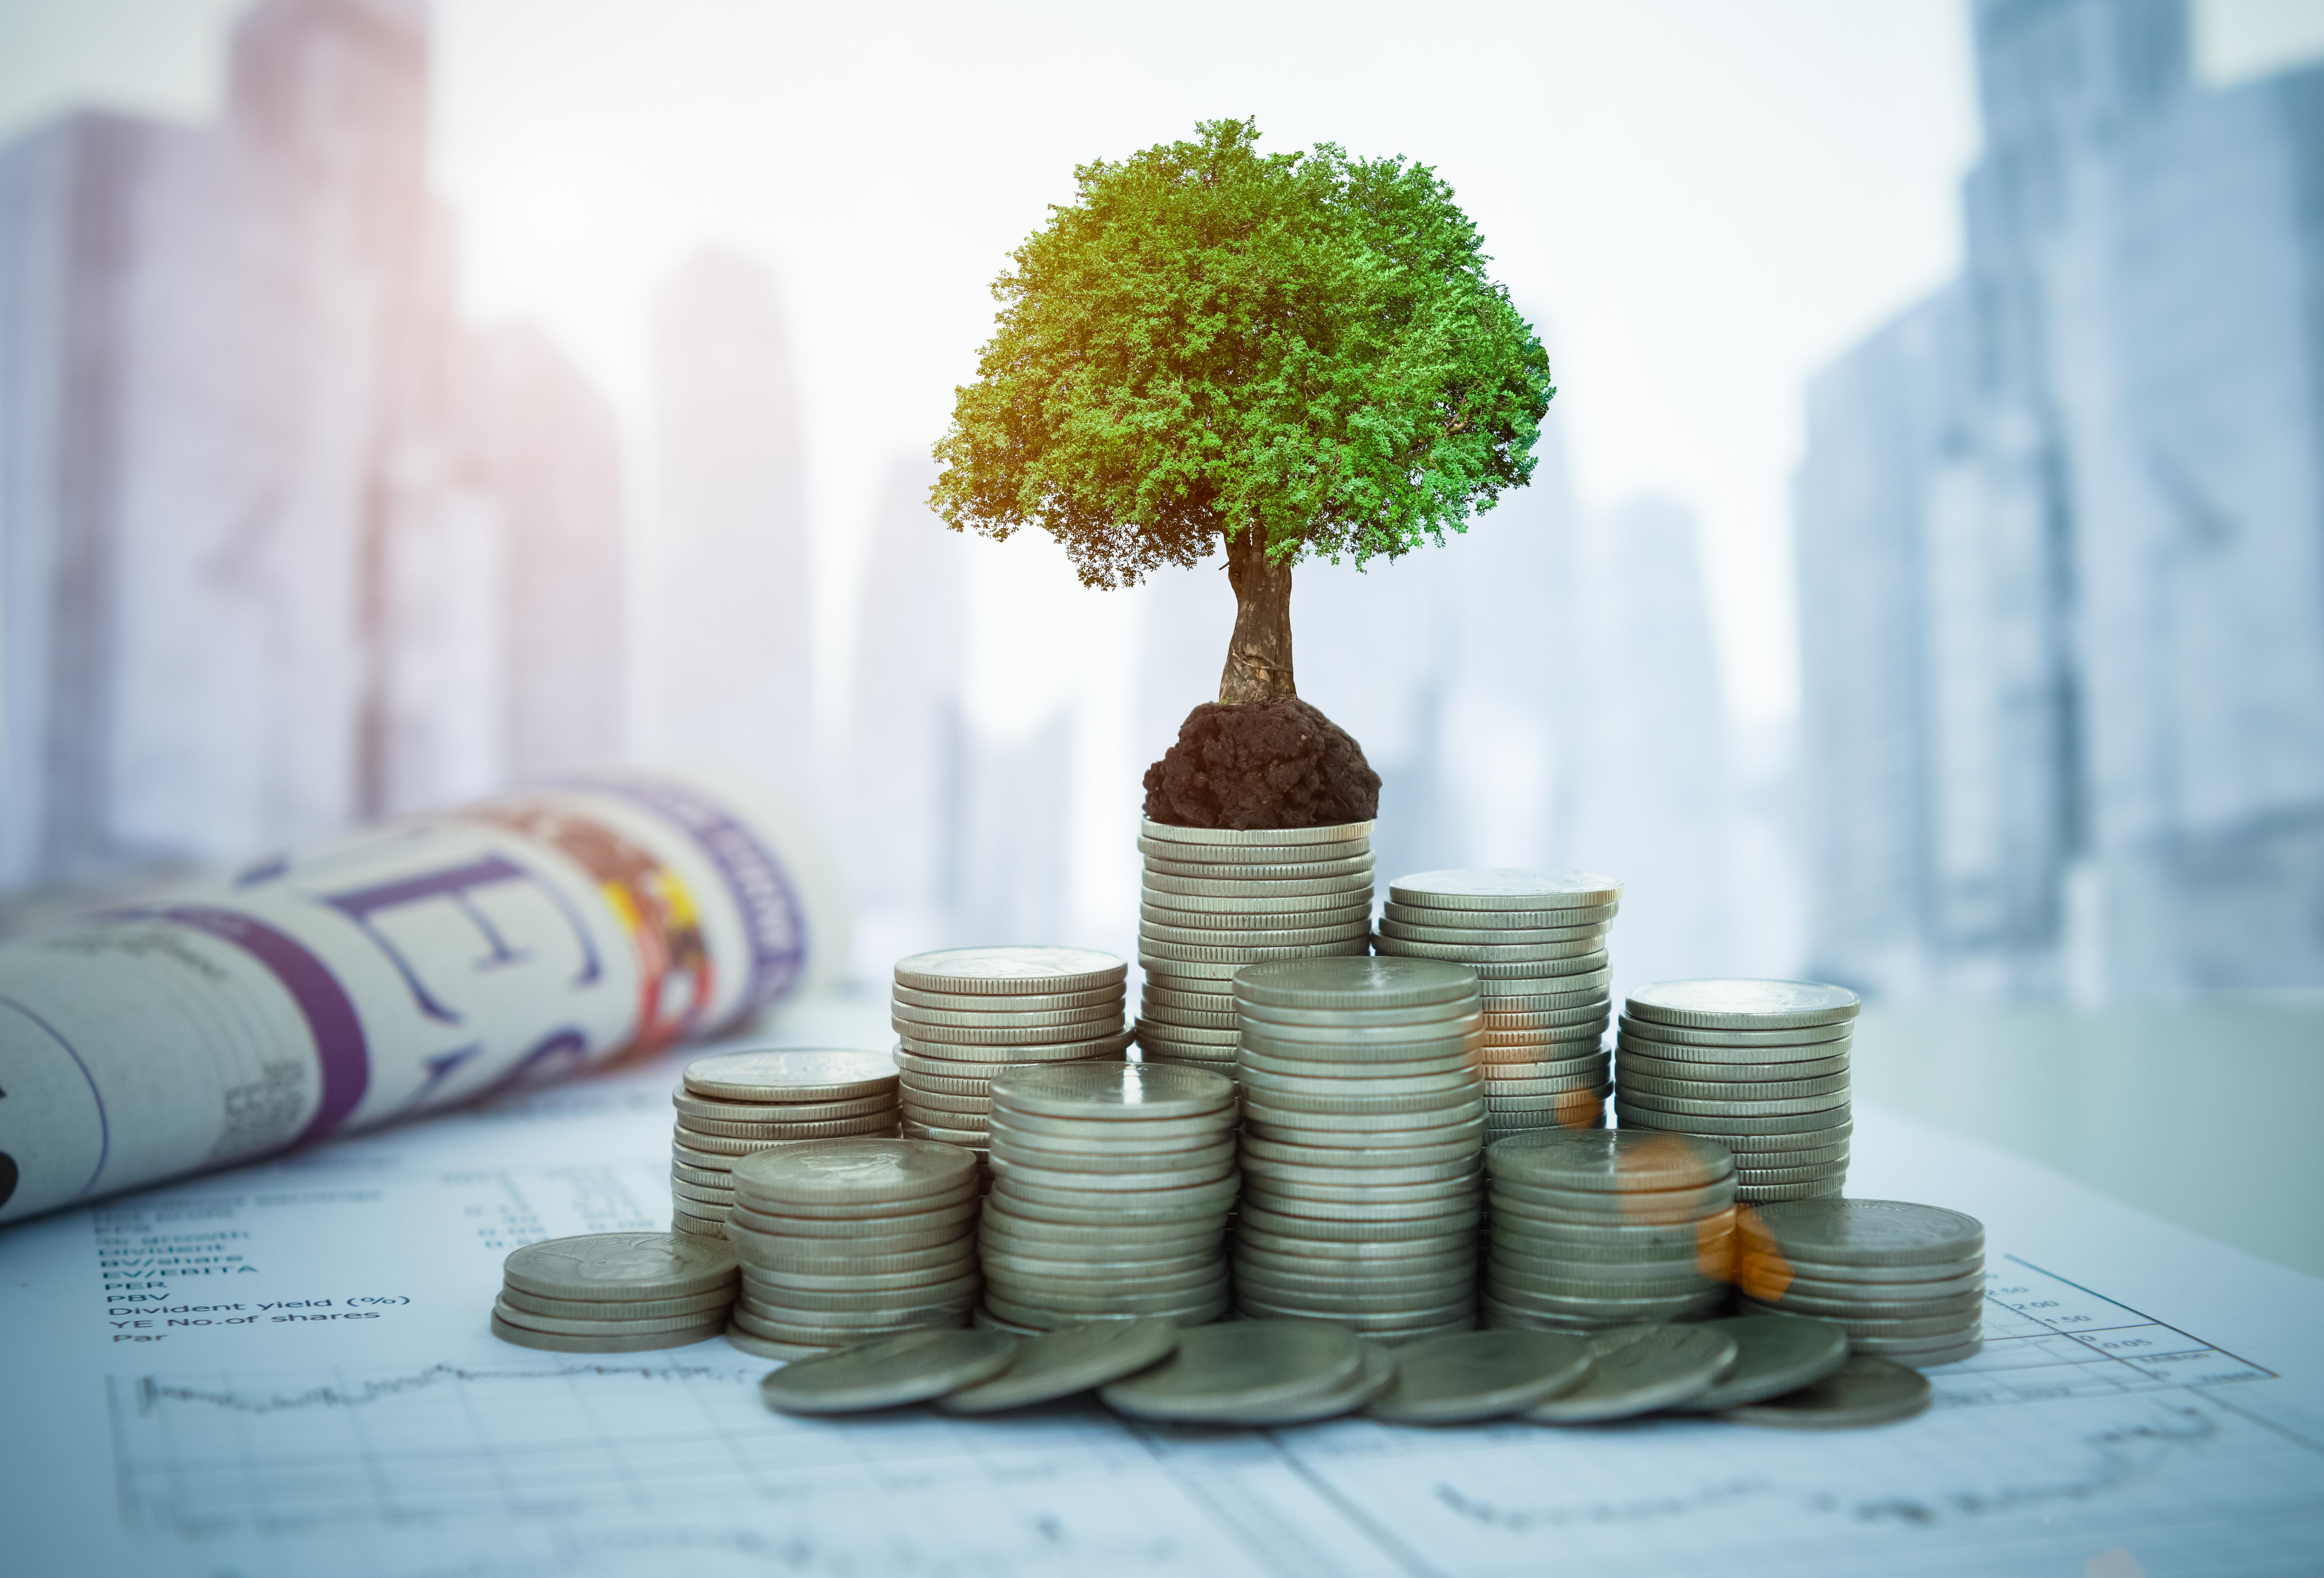 Tree growing on money